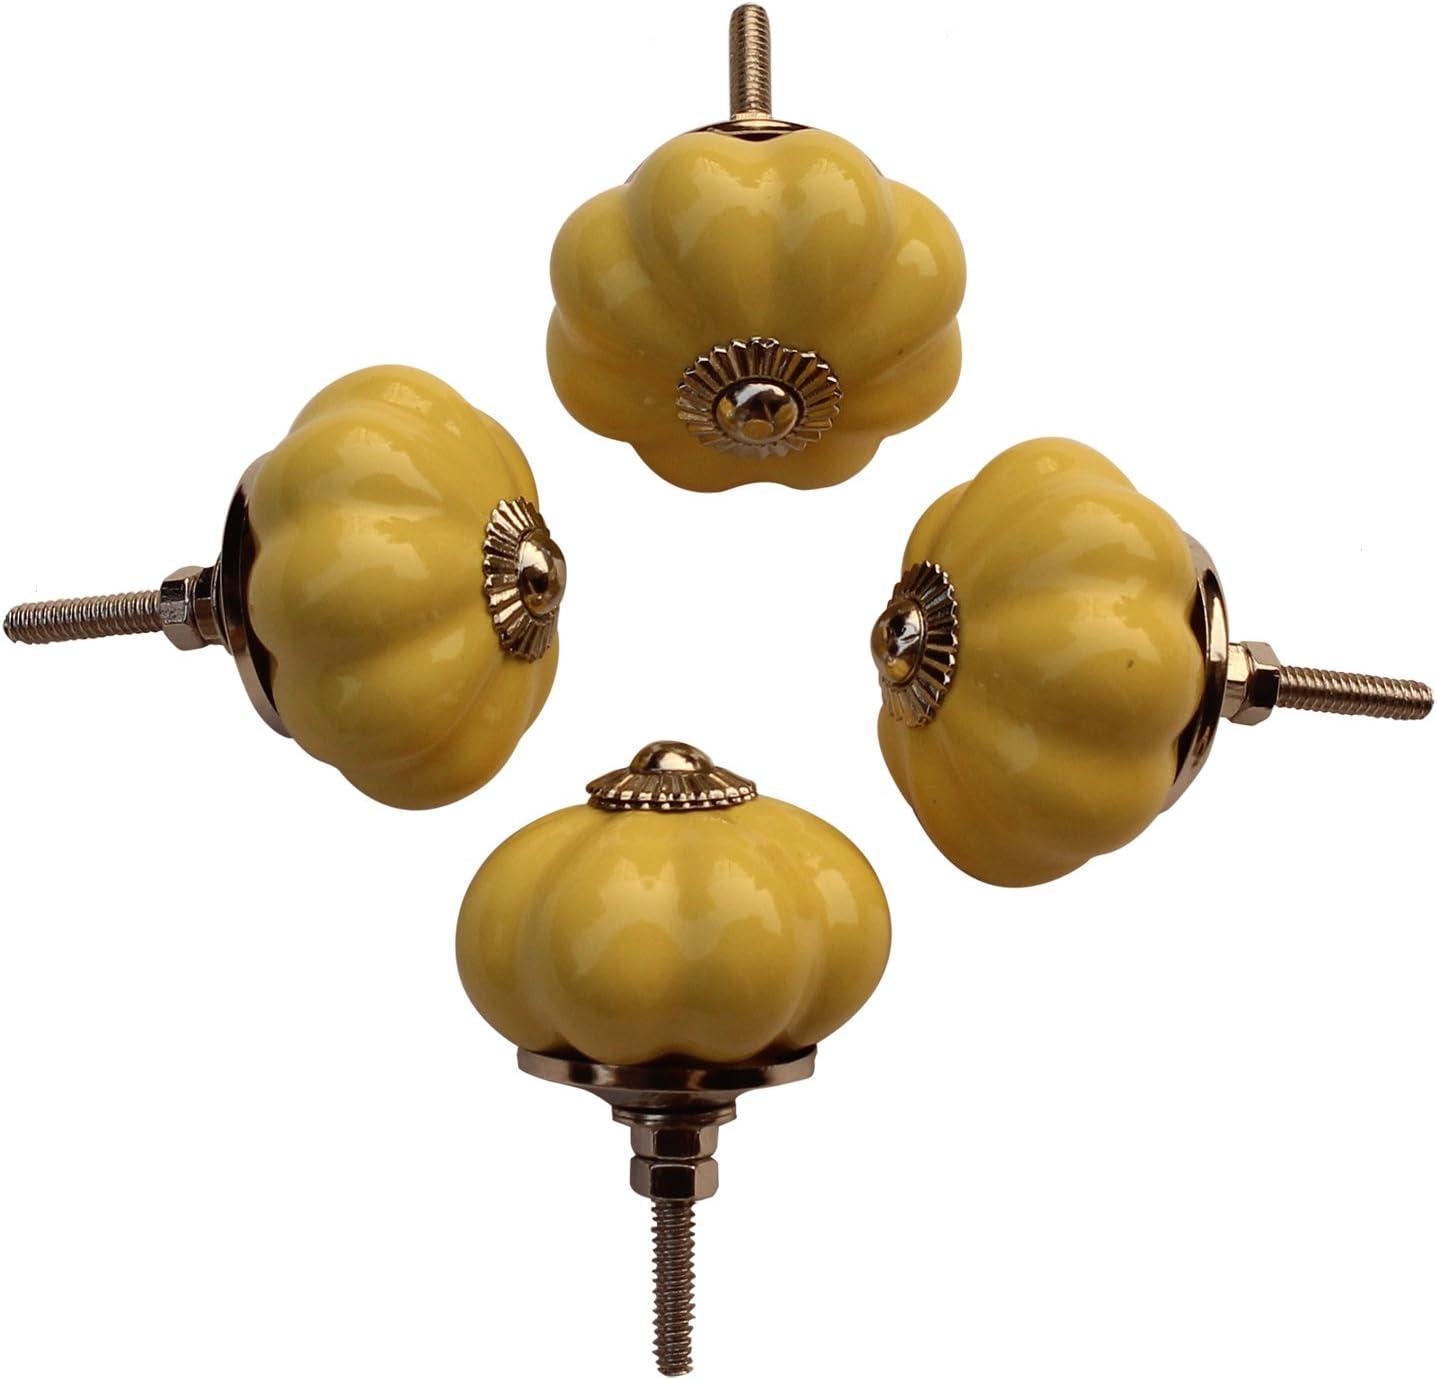 Thanksgiving Day Gift - abhandicrafts - Set of 4 Ceramic Yellow Pumpkin Decorative Antique Door Knobs- Pulls for Cabinet/Girls Dresser/Kids Cupboard/Kitchen Drawer Handles with Hardware Attached